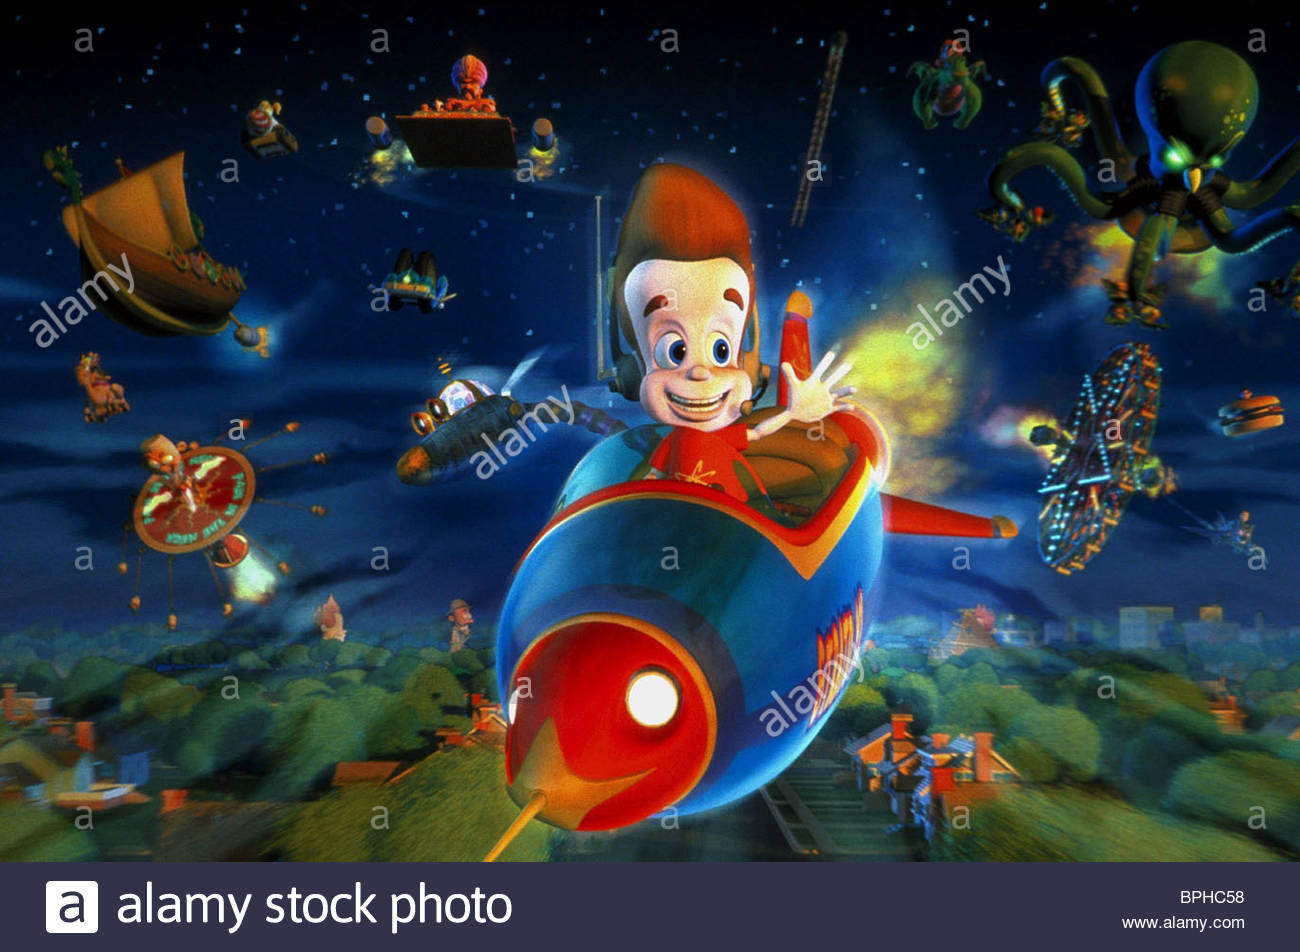 image jimmy neutron boy genius amusement park space armada jpg